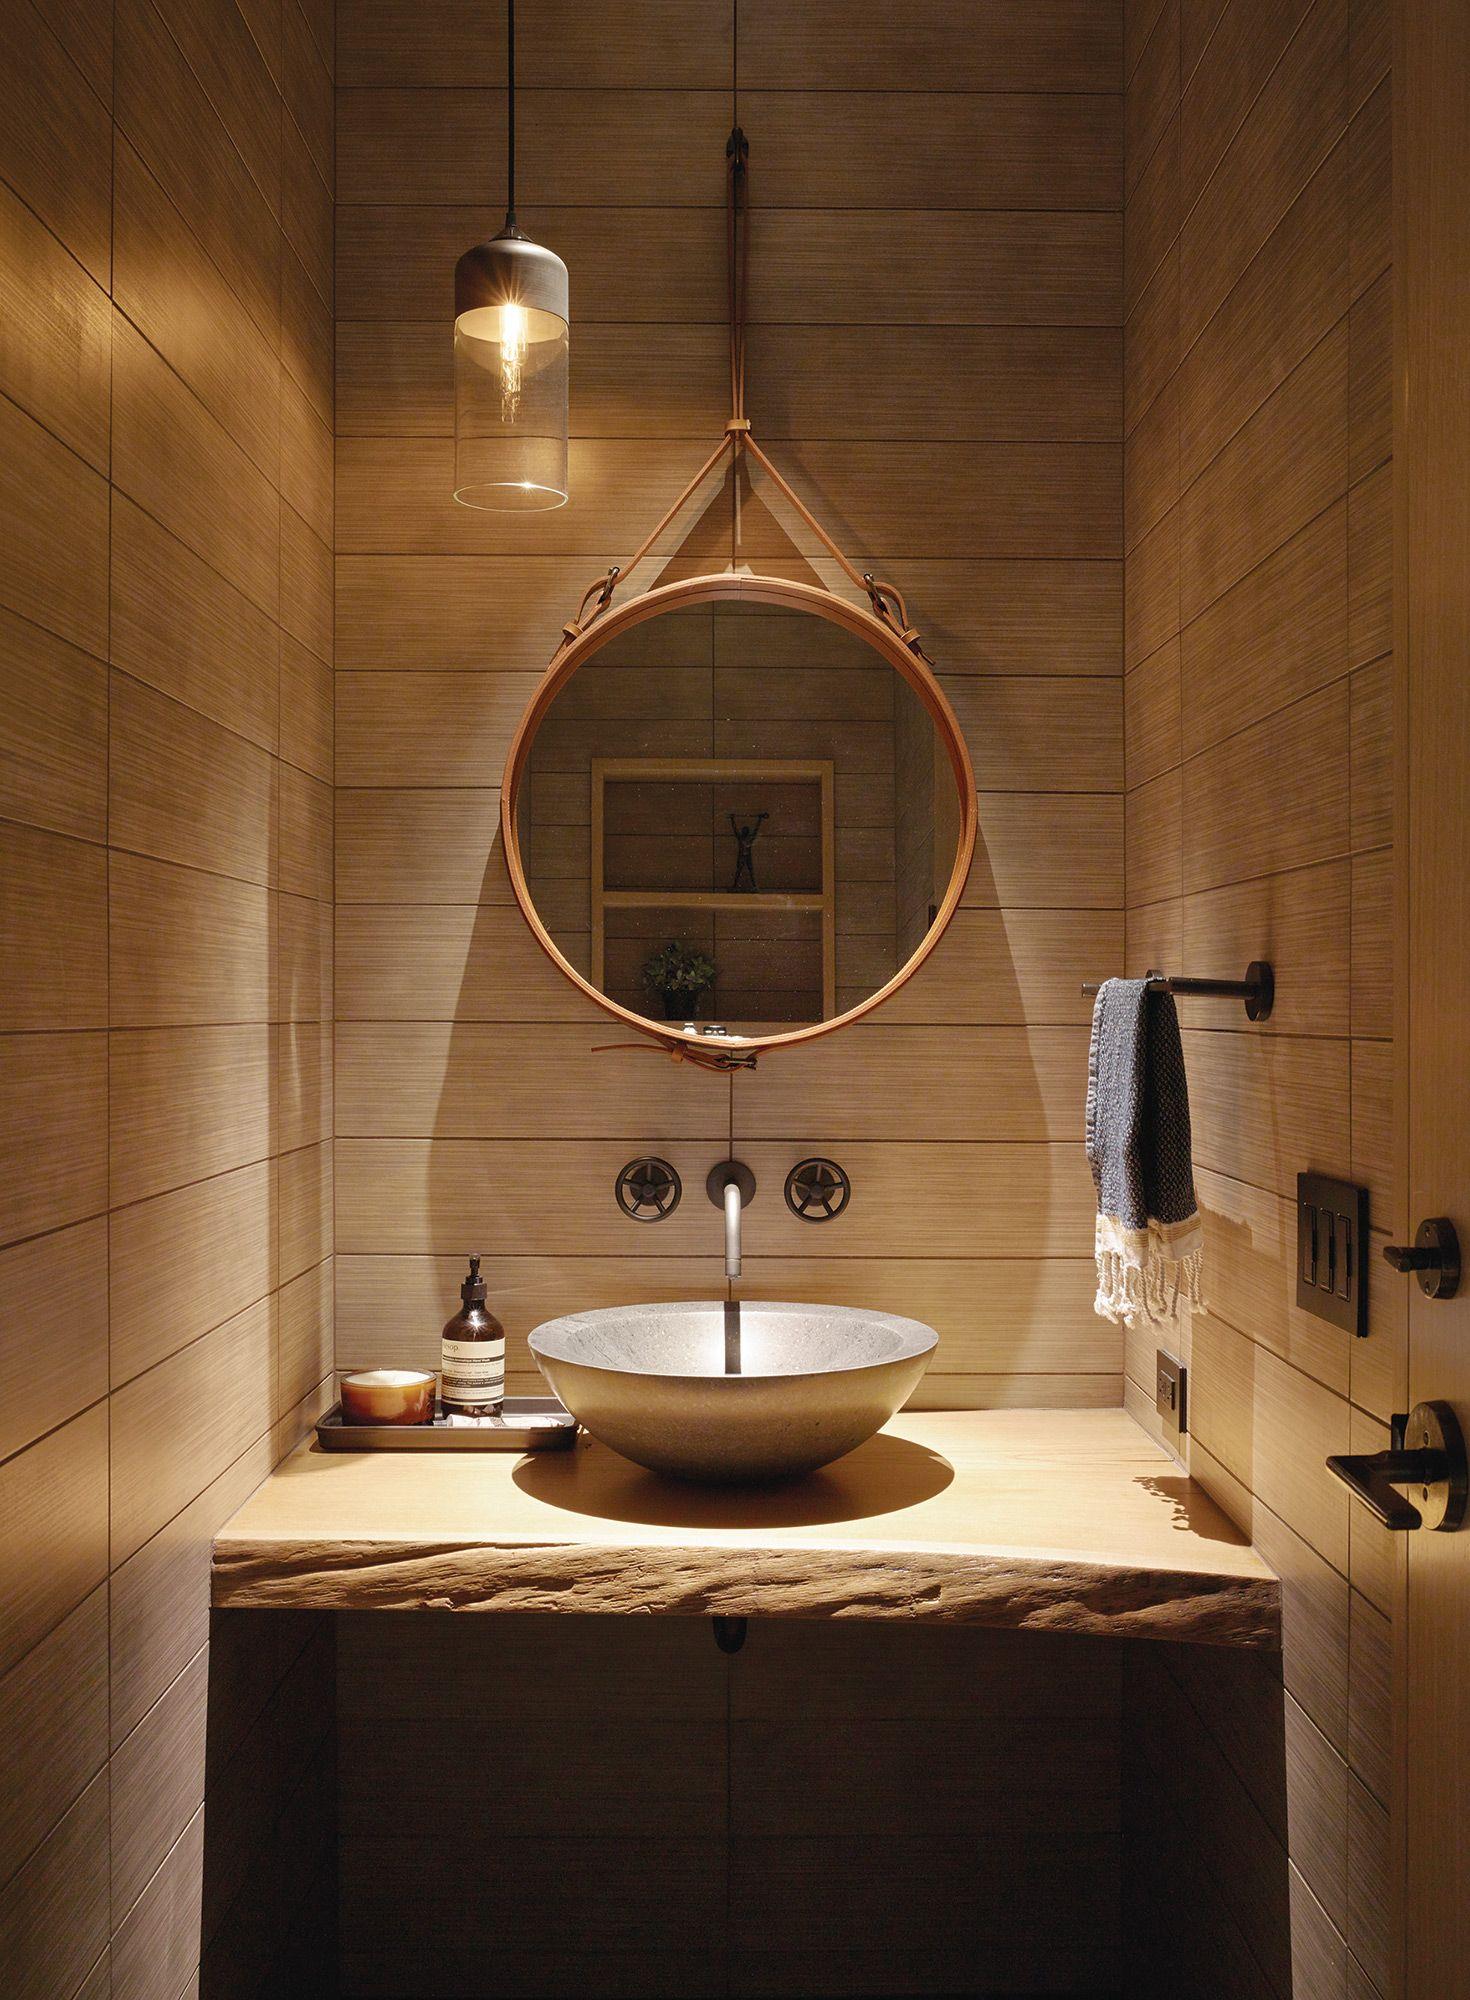 Western Design Simple Beauty Badezimmer Rustikal Star Wars Badezimmer Tolle Badezimmer